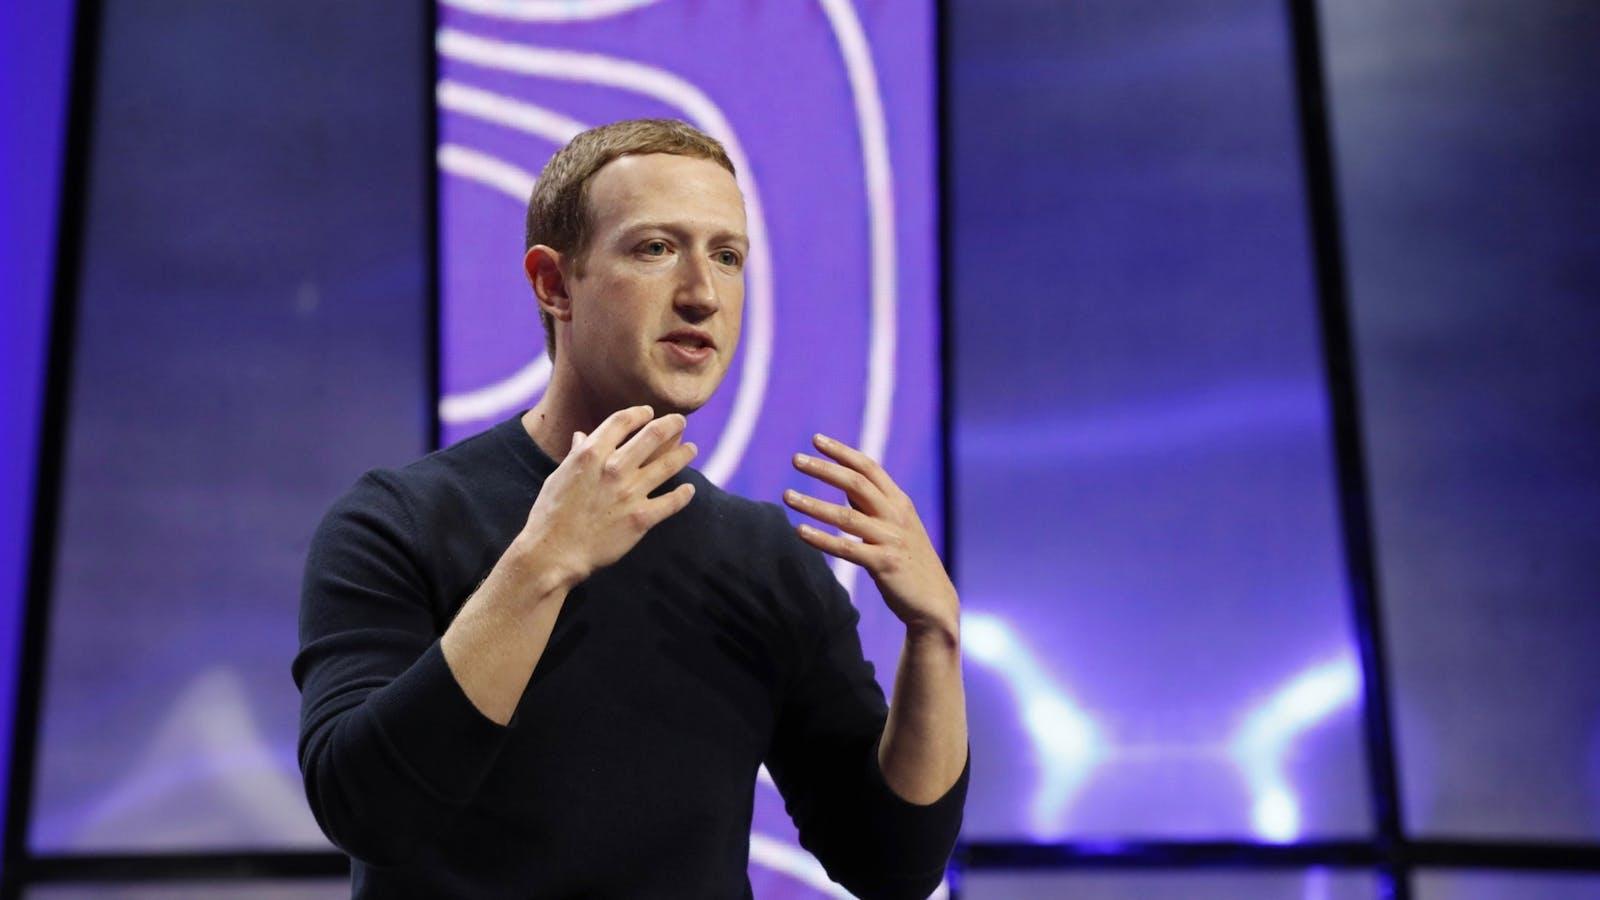 Facebook CEO Mark Zuckerberg. Photo: Bloomberg